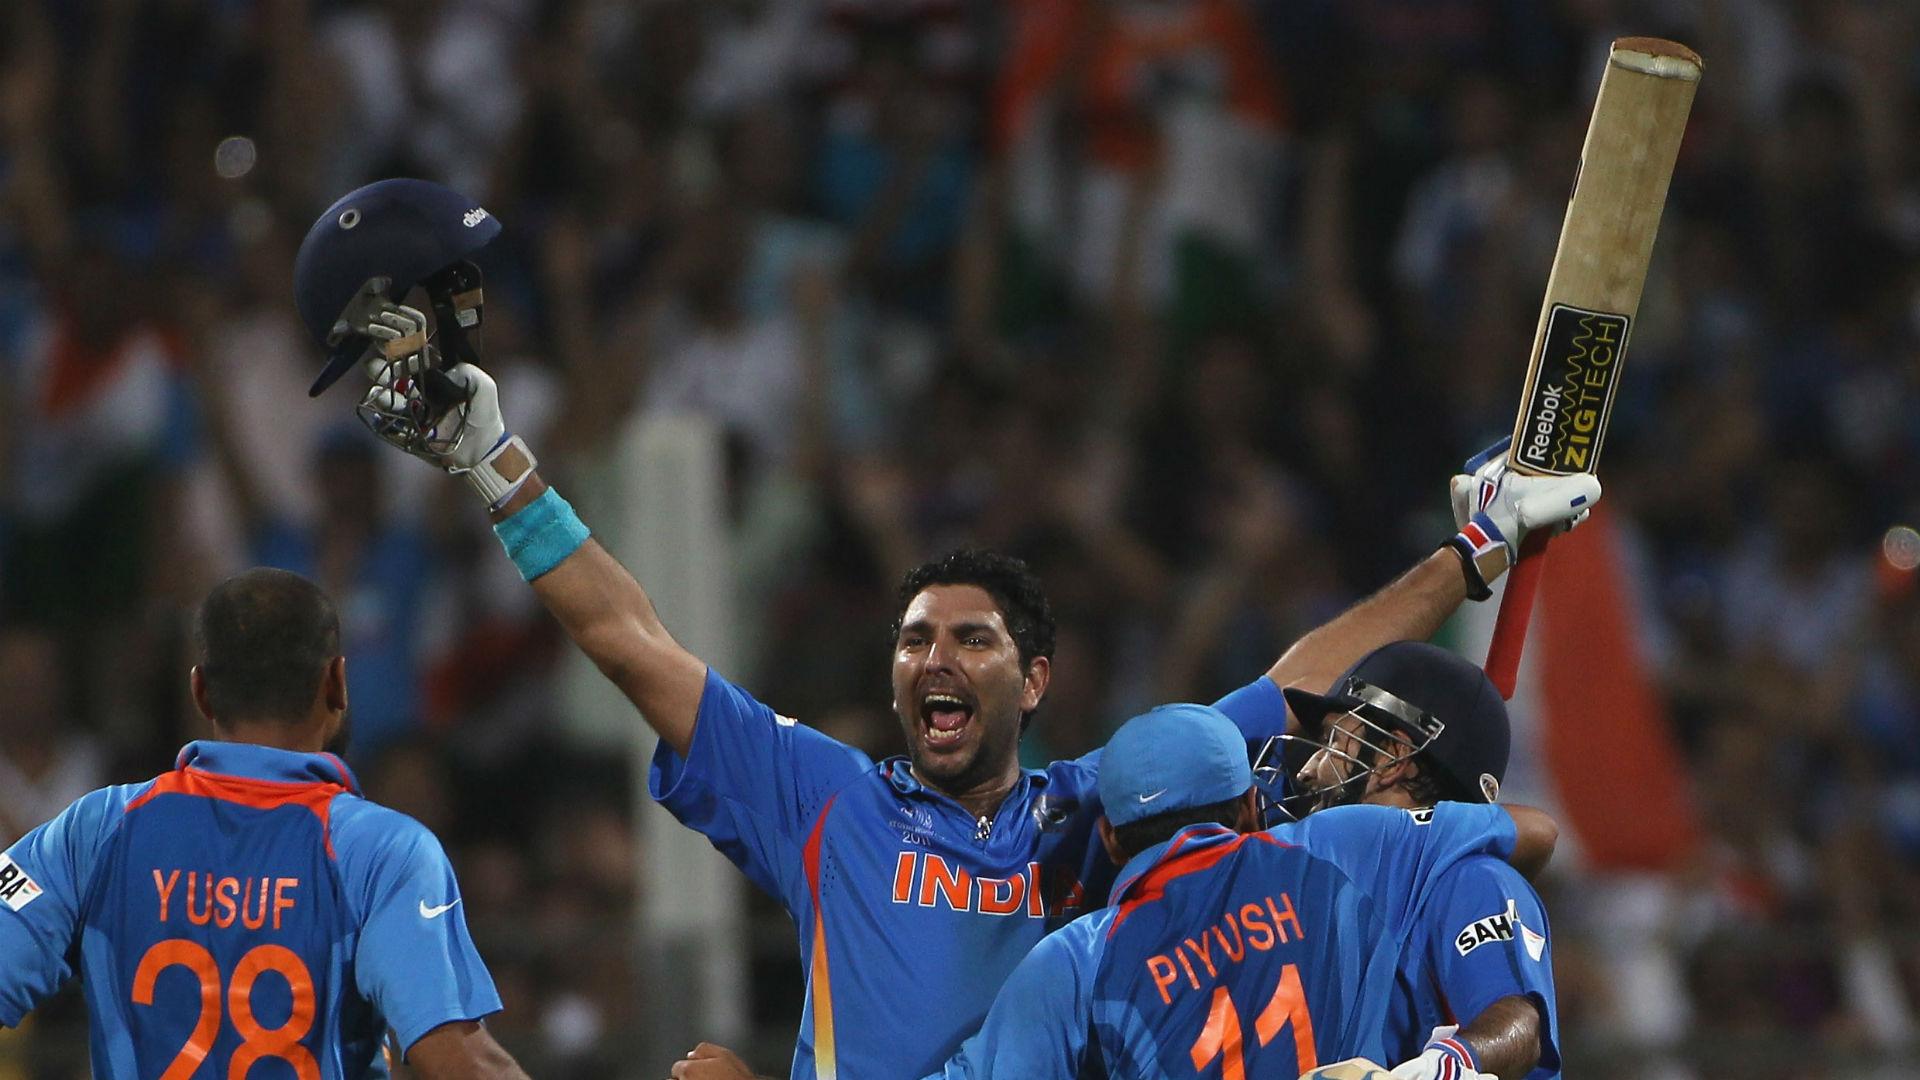 World Cup hero, brutal Broad demolition - retiring Yuvraj Singh's career highlights